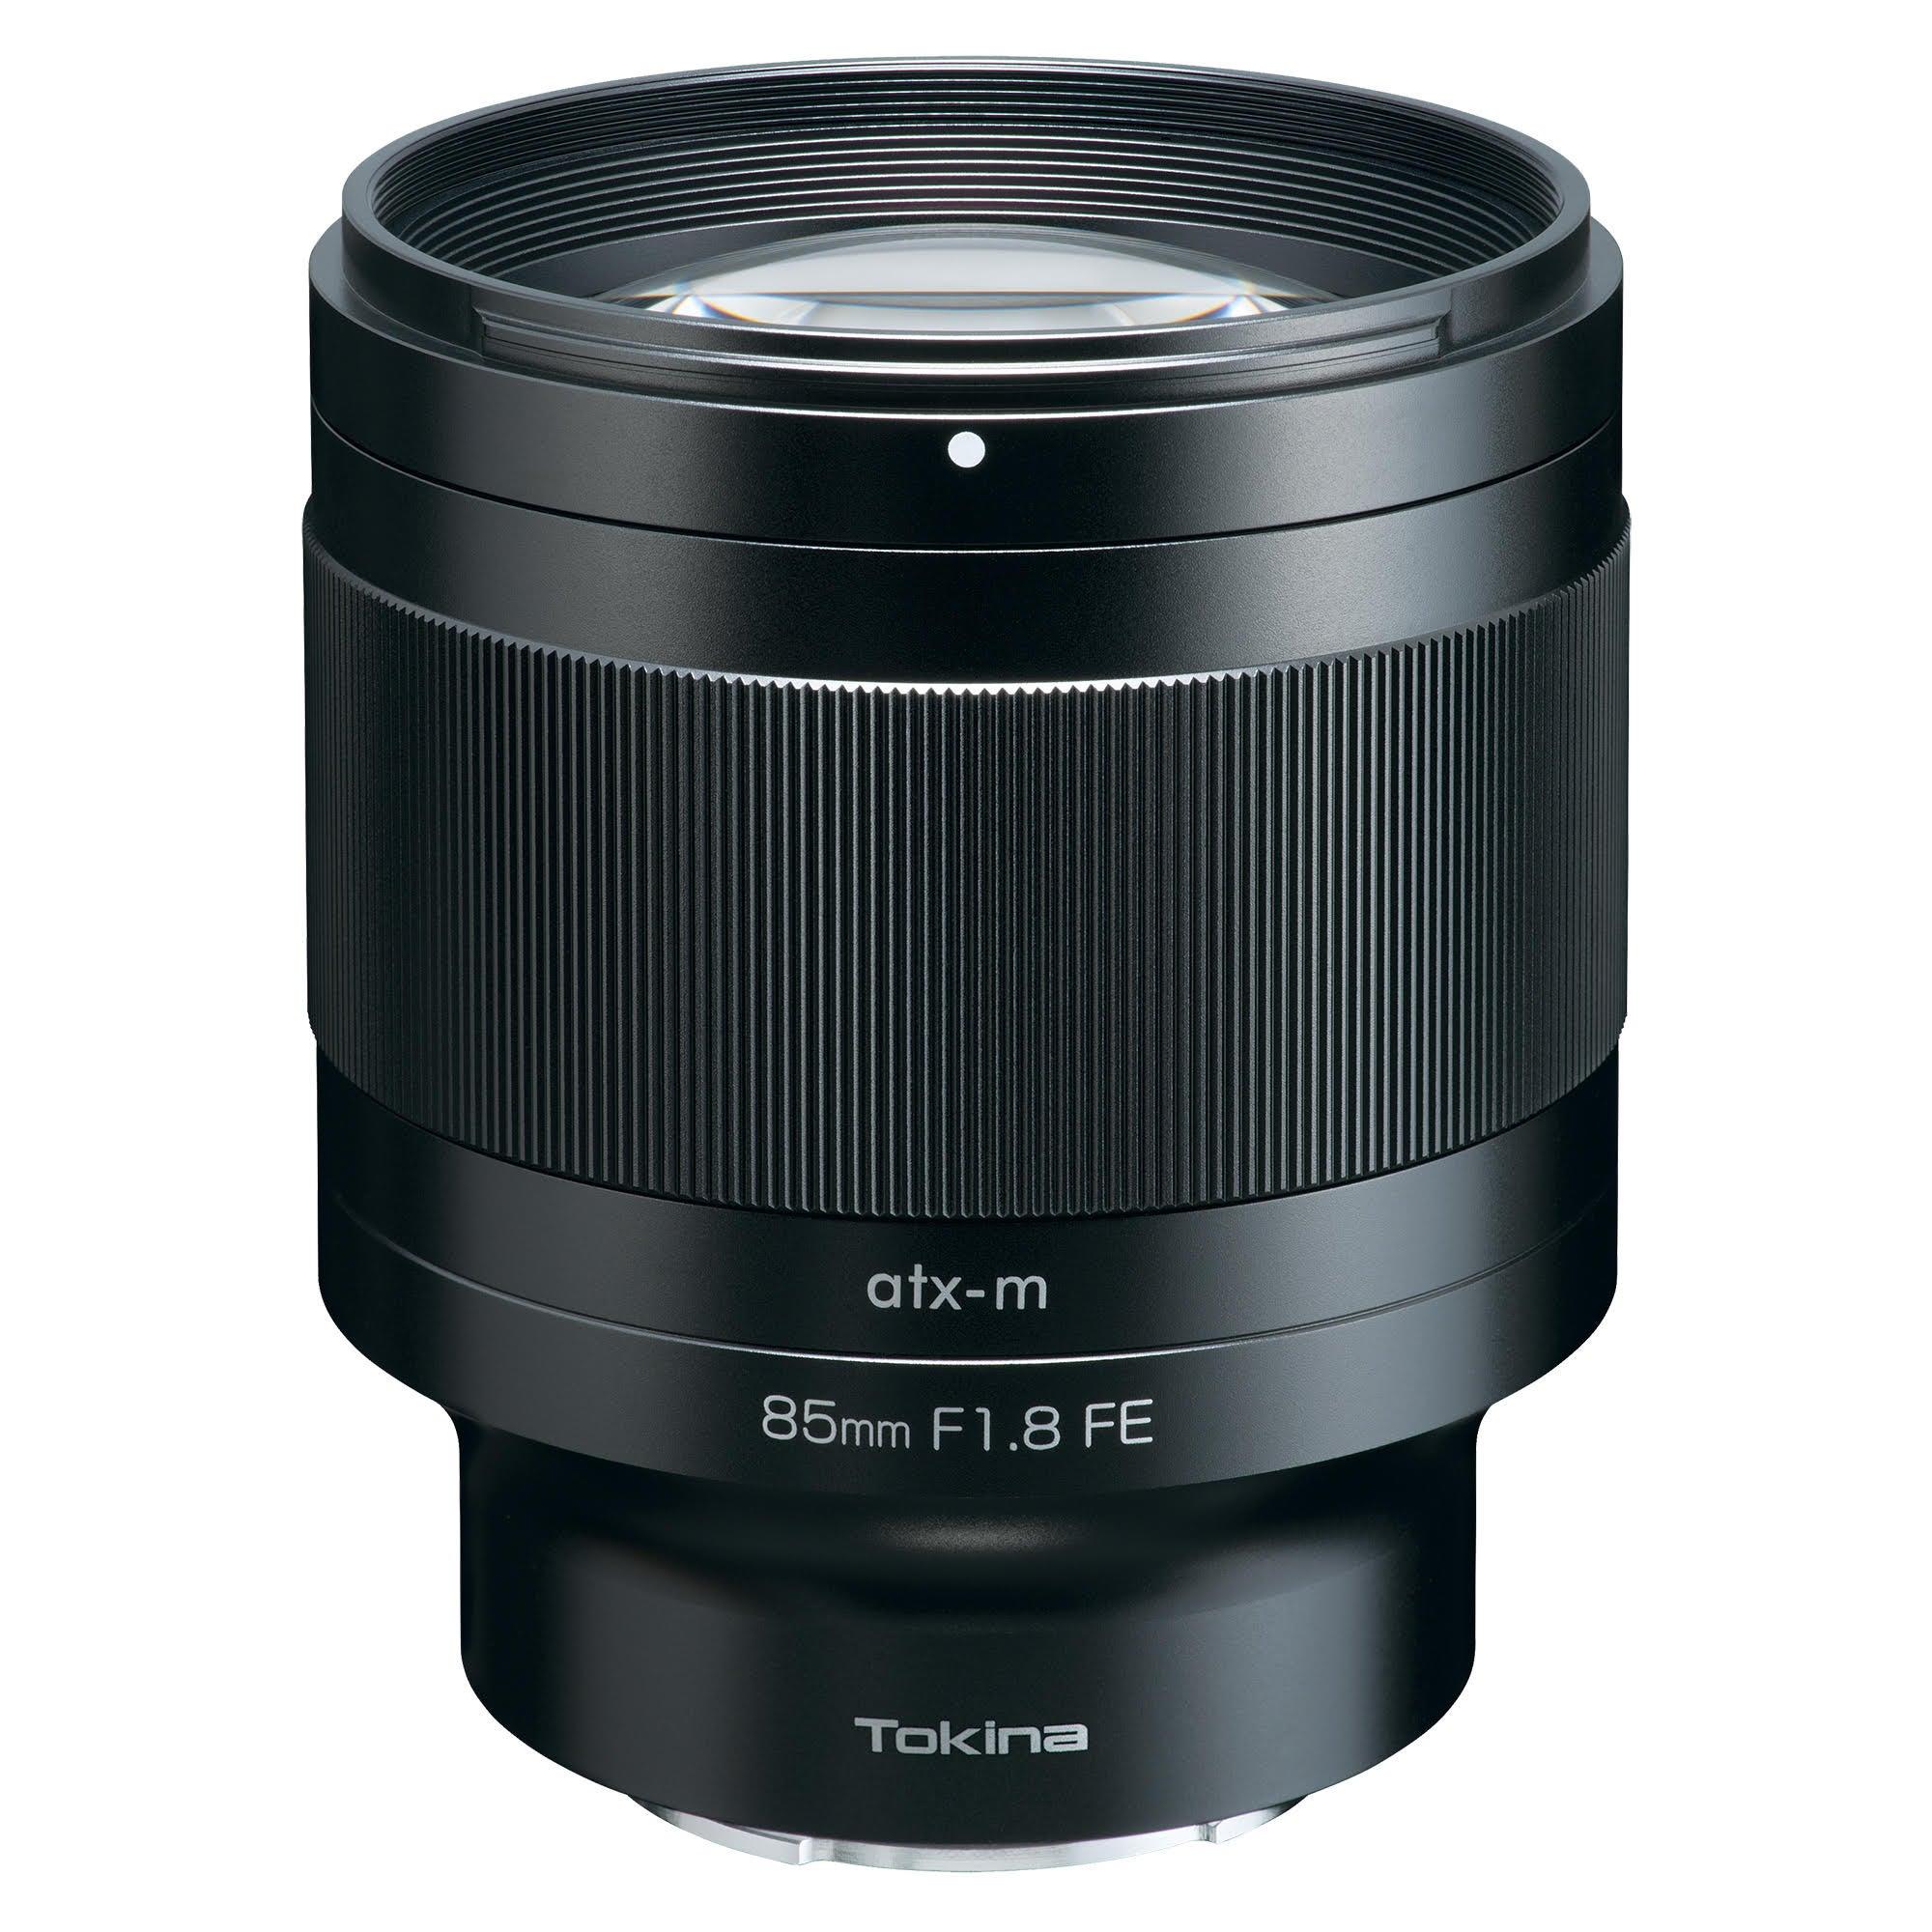 Tokina ATX-M 85mm f/1.8 lens